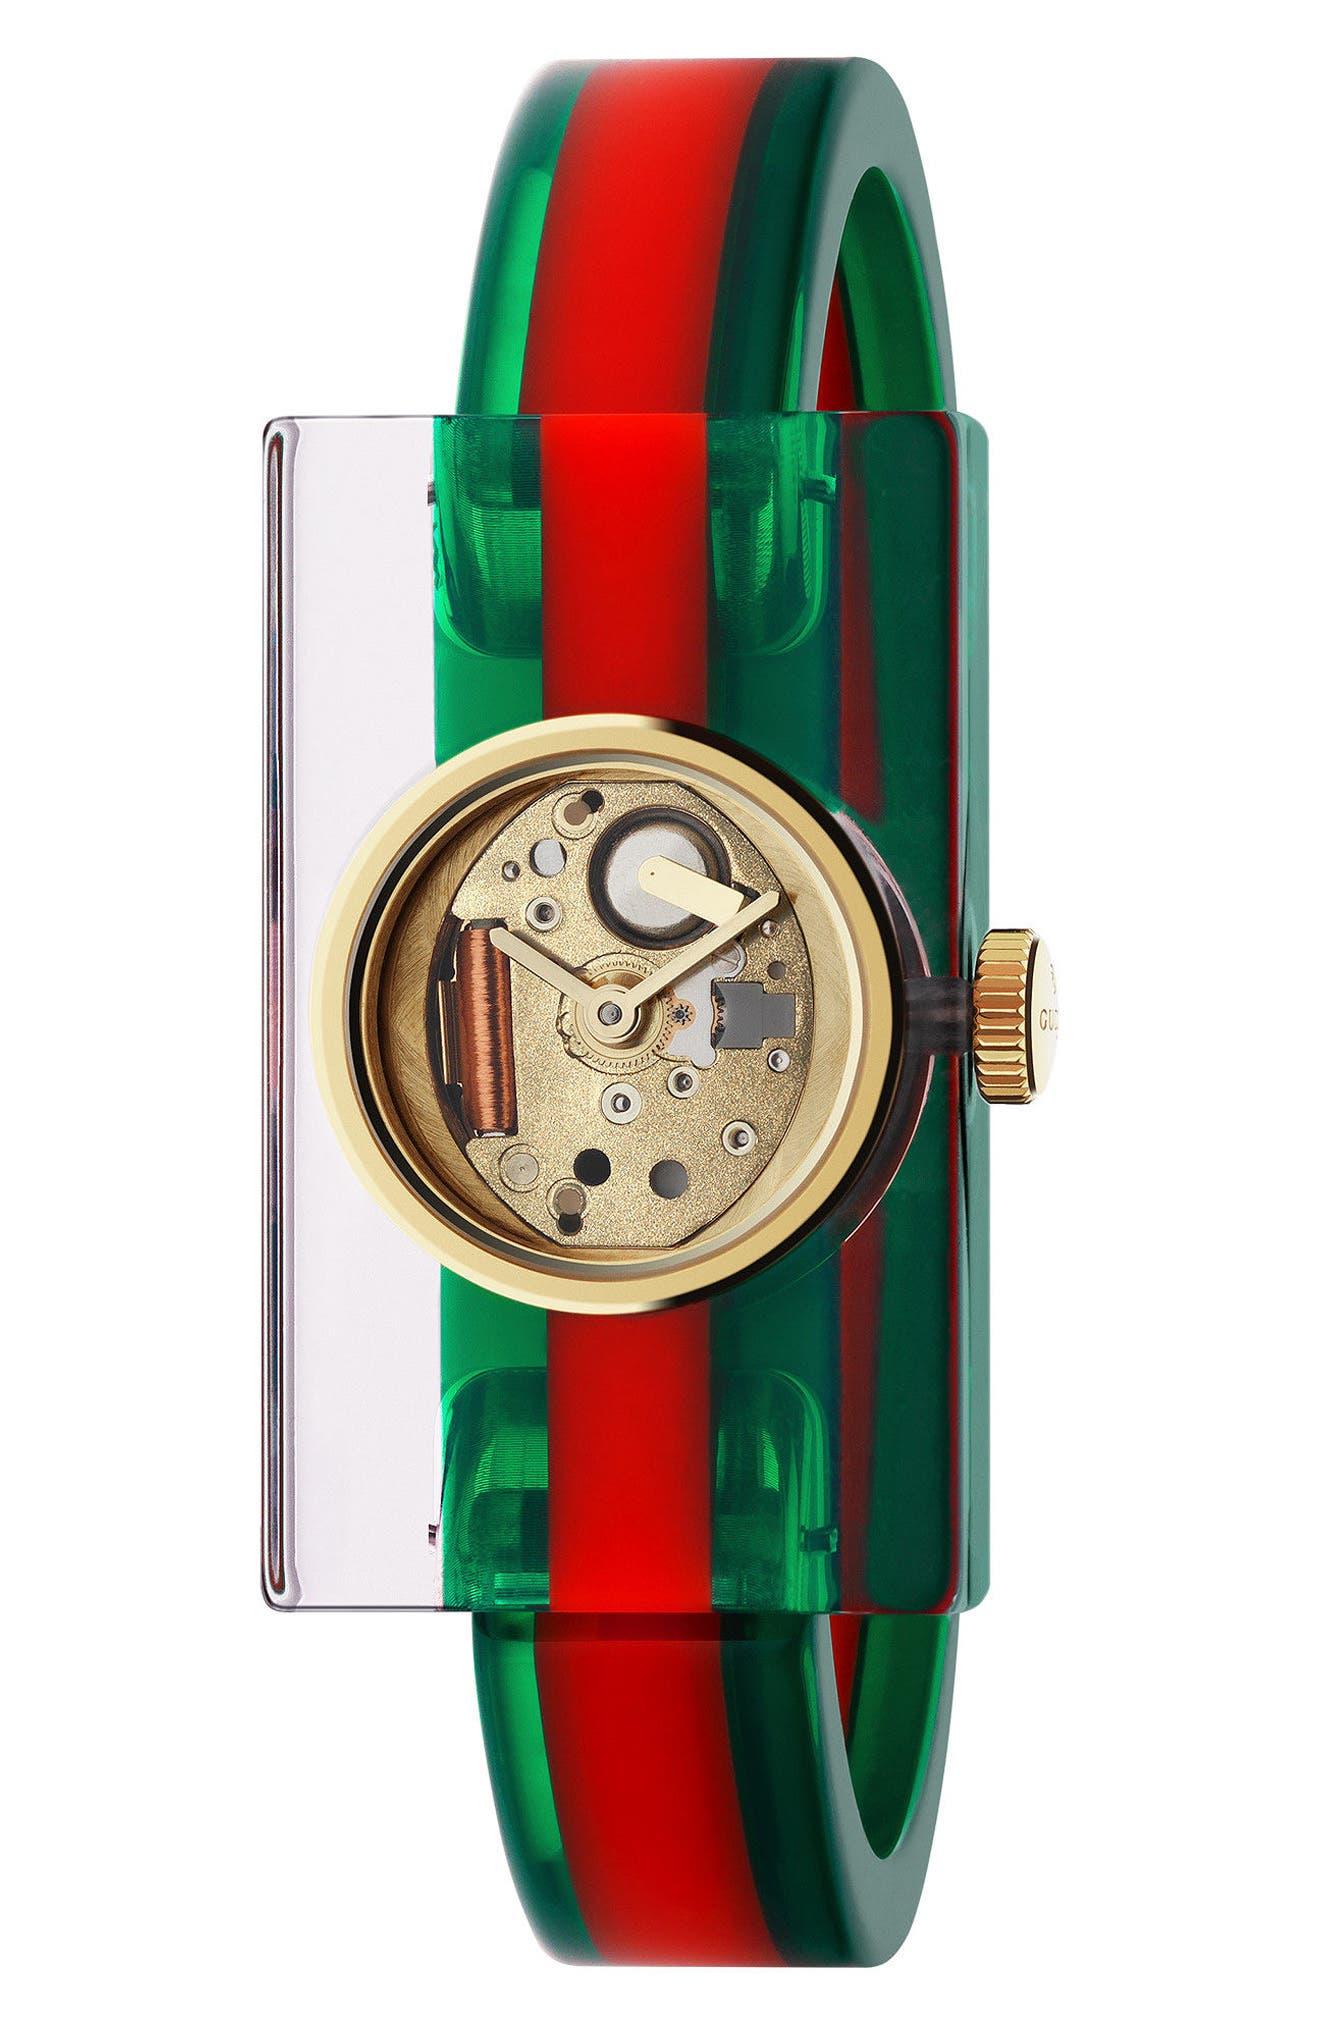 Main Image - Gucci Plexiglas Bracelet Watch, 24mm x 40mm